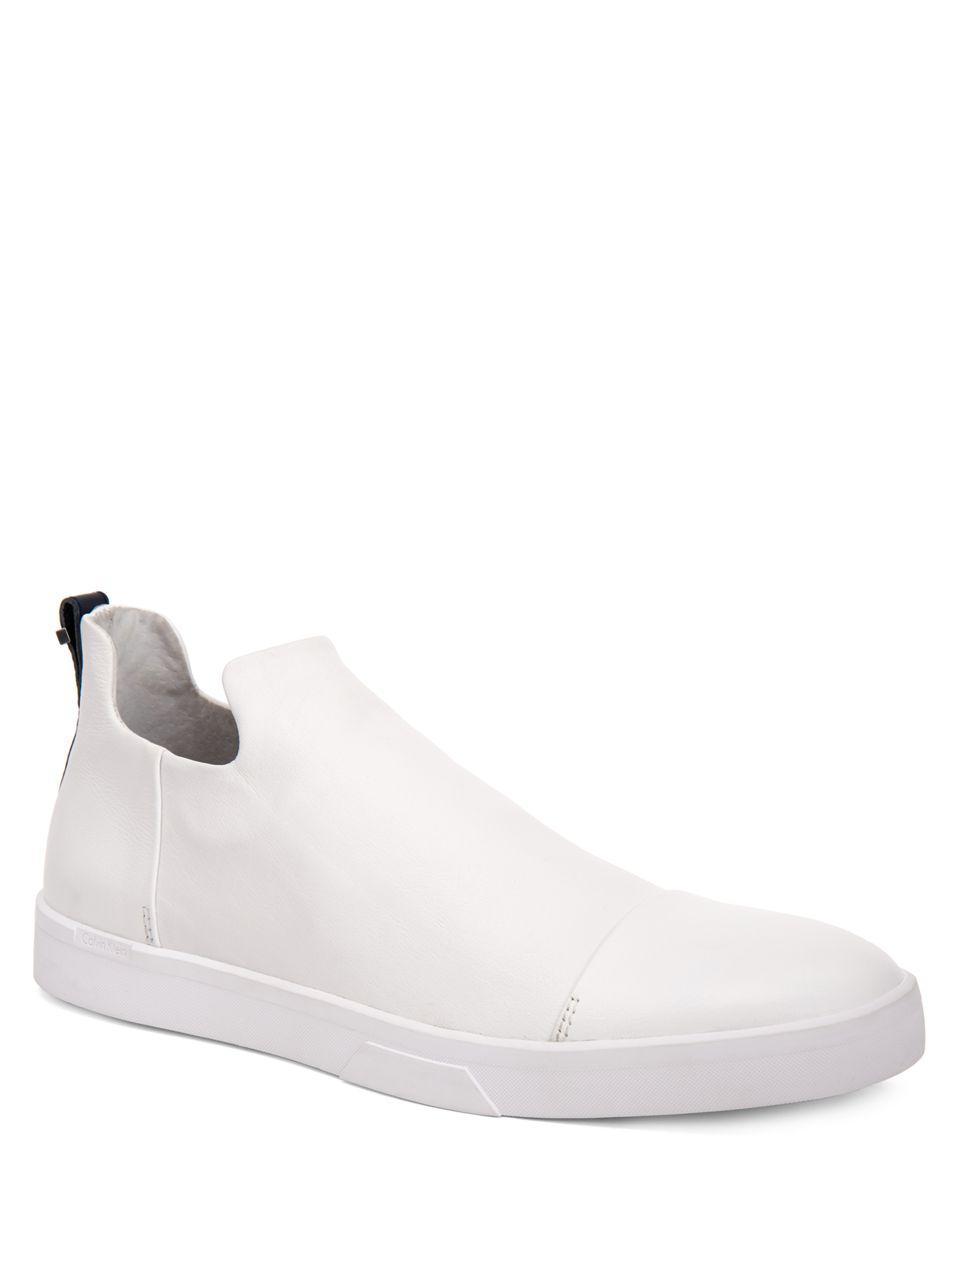 nappa leather sneakers - White CALVIN KLEIN 205W39NYC Cheap Buy 6Xx9r